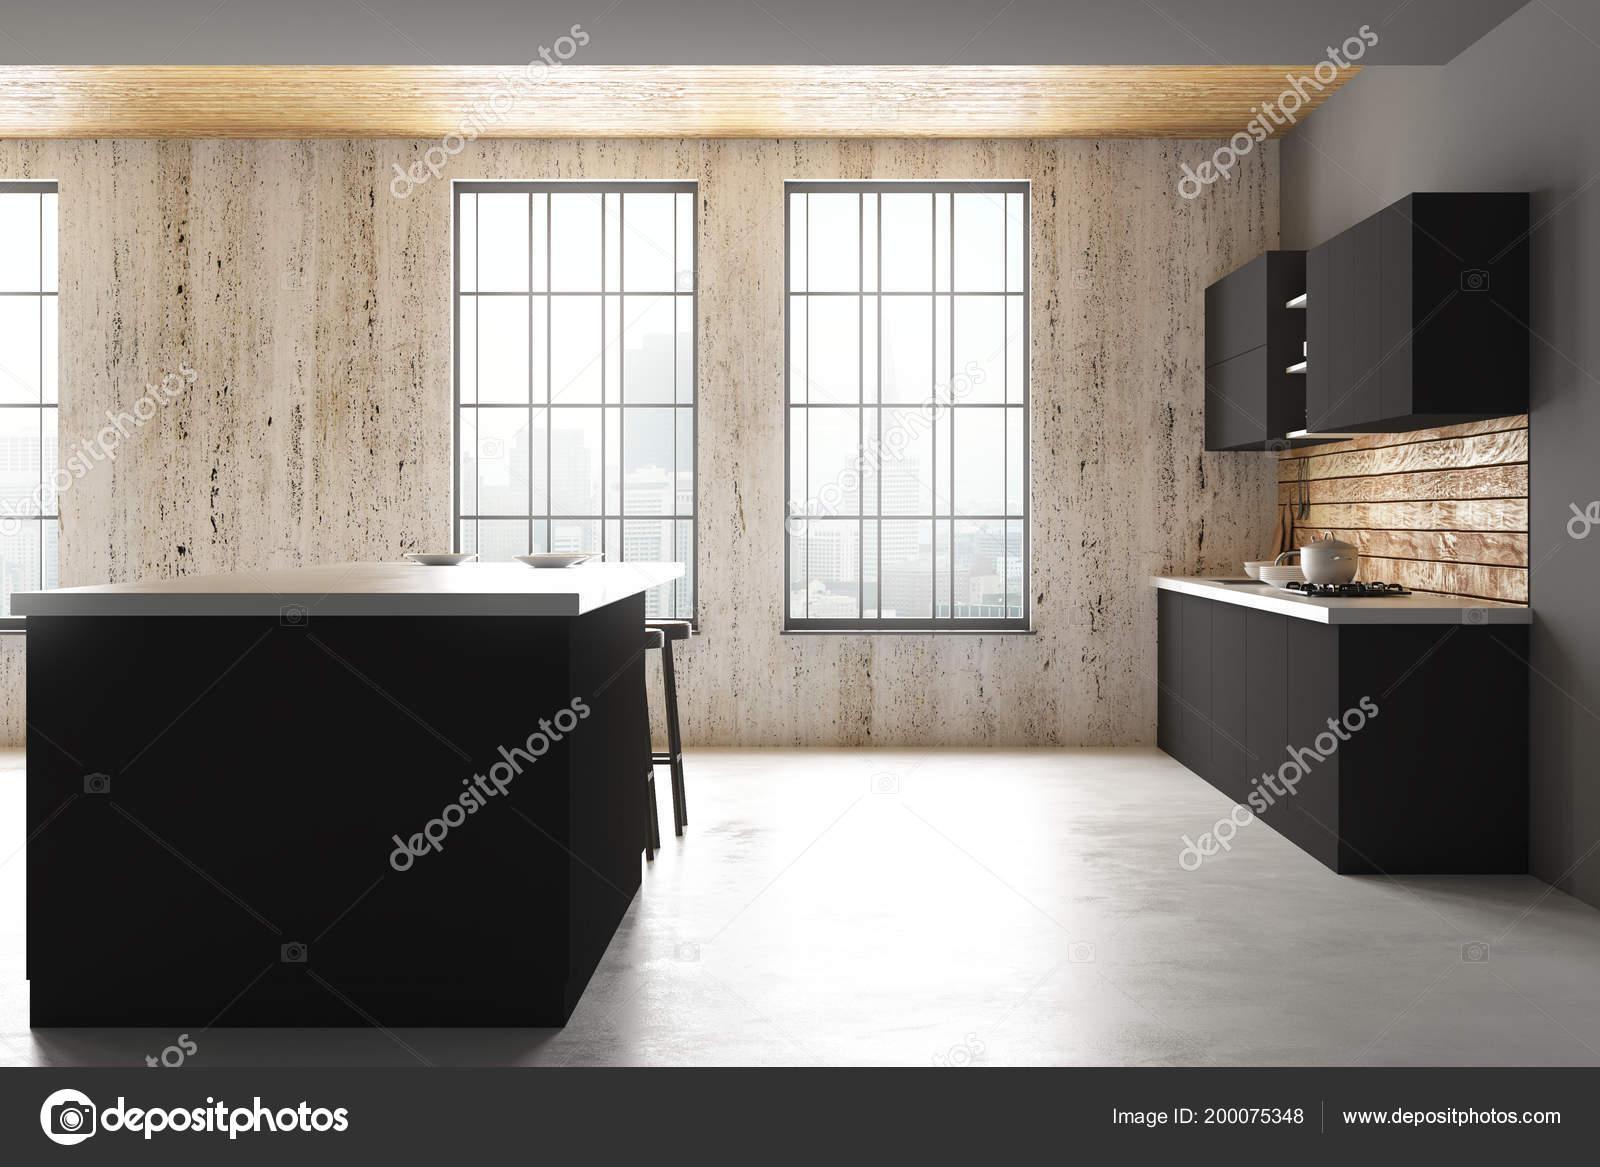 Daglicht Je Keuken : Moderne beton keuken interieur met uitzicht daglicht kopie ruimte